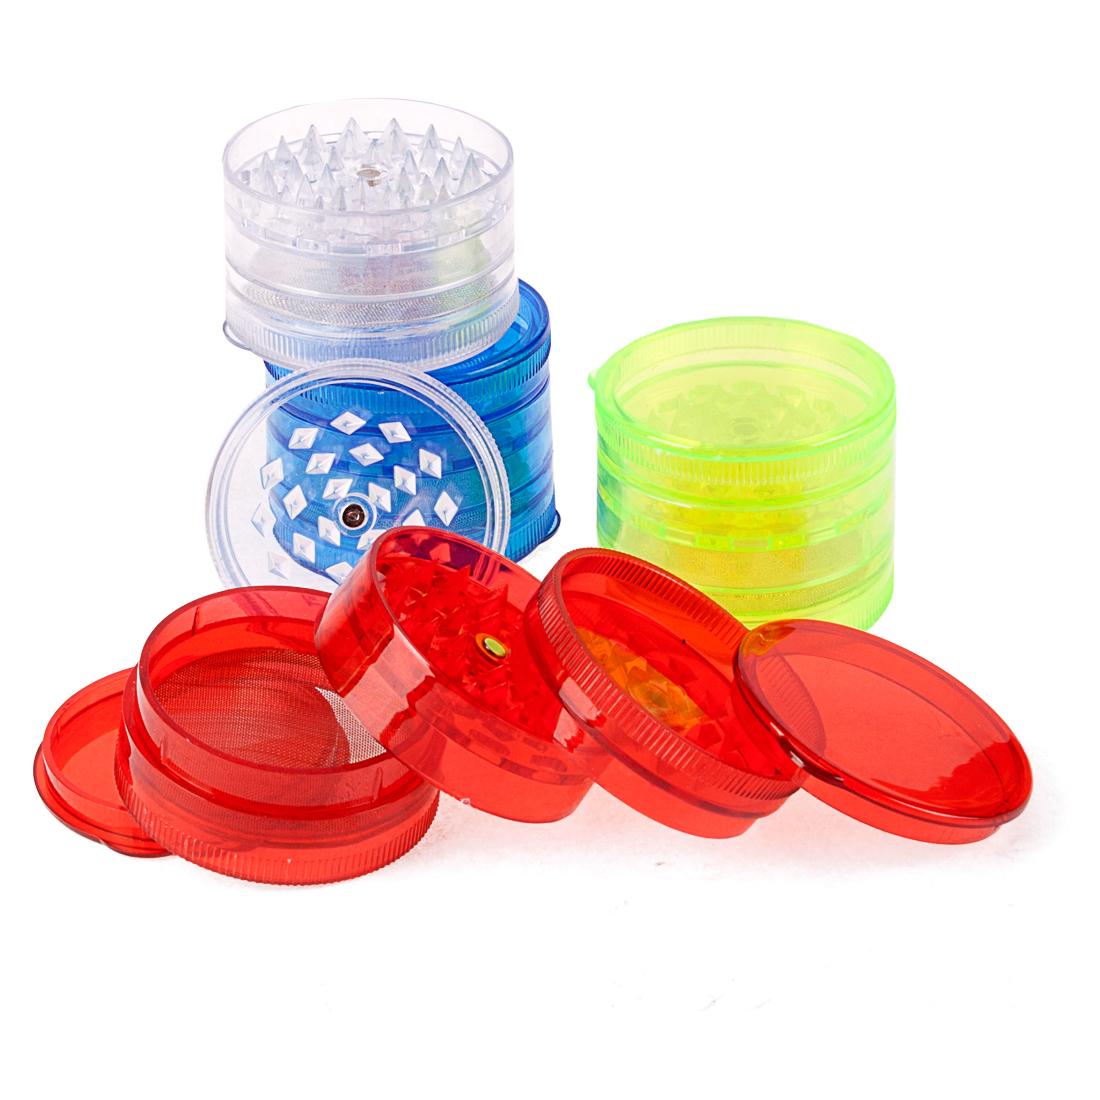 grinder acrylique 4 parties